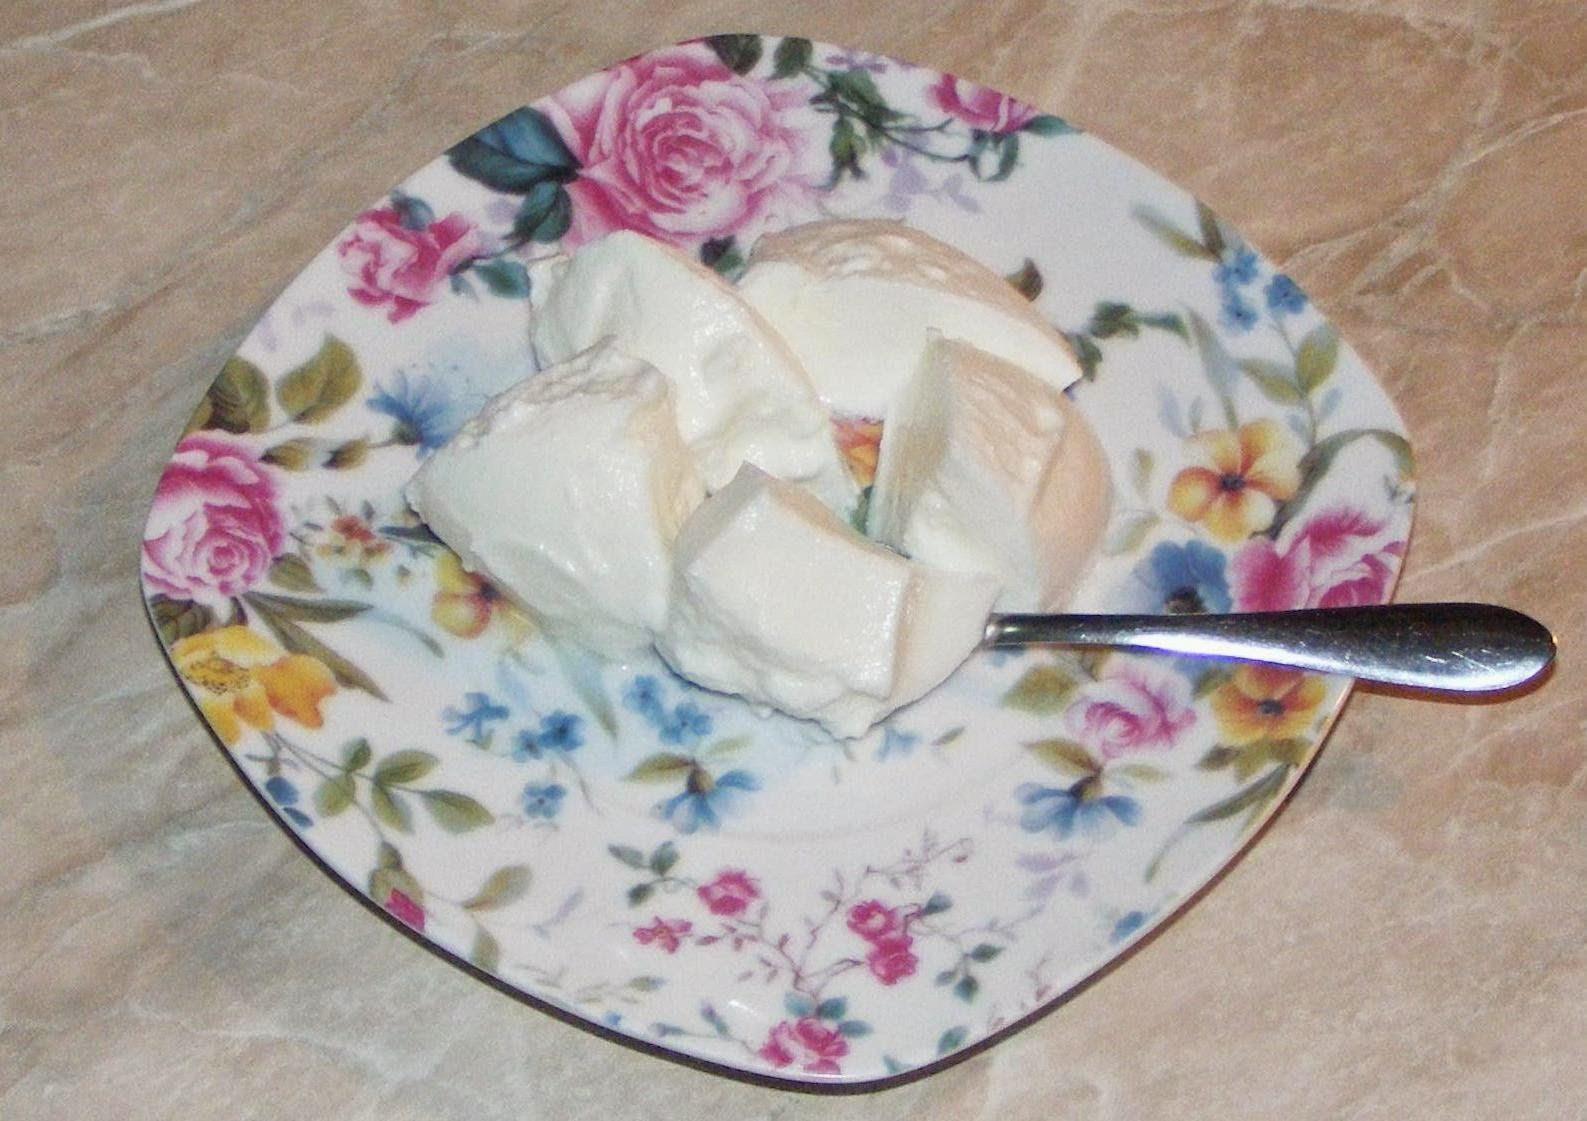 iaurt, iaurt de casa, iaurt din lapte de vaca, iaurt din lapte de oaie, iaurt din lapte de capra, iaurt de vaca, iaurt de oaie, iaurt de capra, iaurt preparat de casa, iaurt de tara, iaurt de la tarani, retete cu iaurt, preparate din iaurt, reteta iaurt de casa, iaurt natural, iaurt gustos, iaurt cremos, iaurt gras, iaurt dietetic,